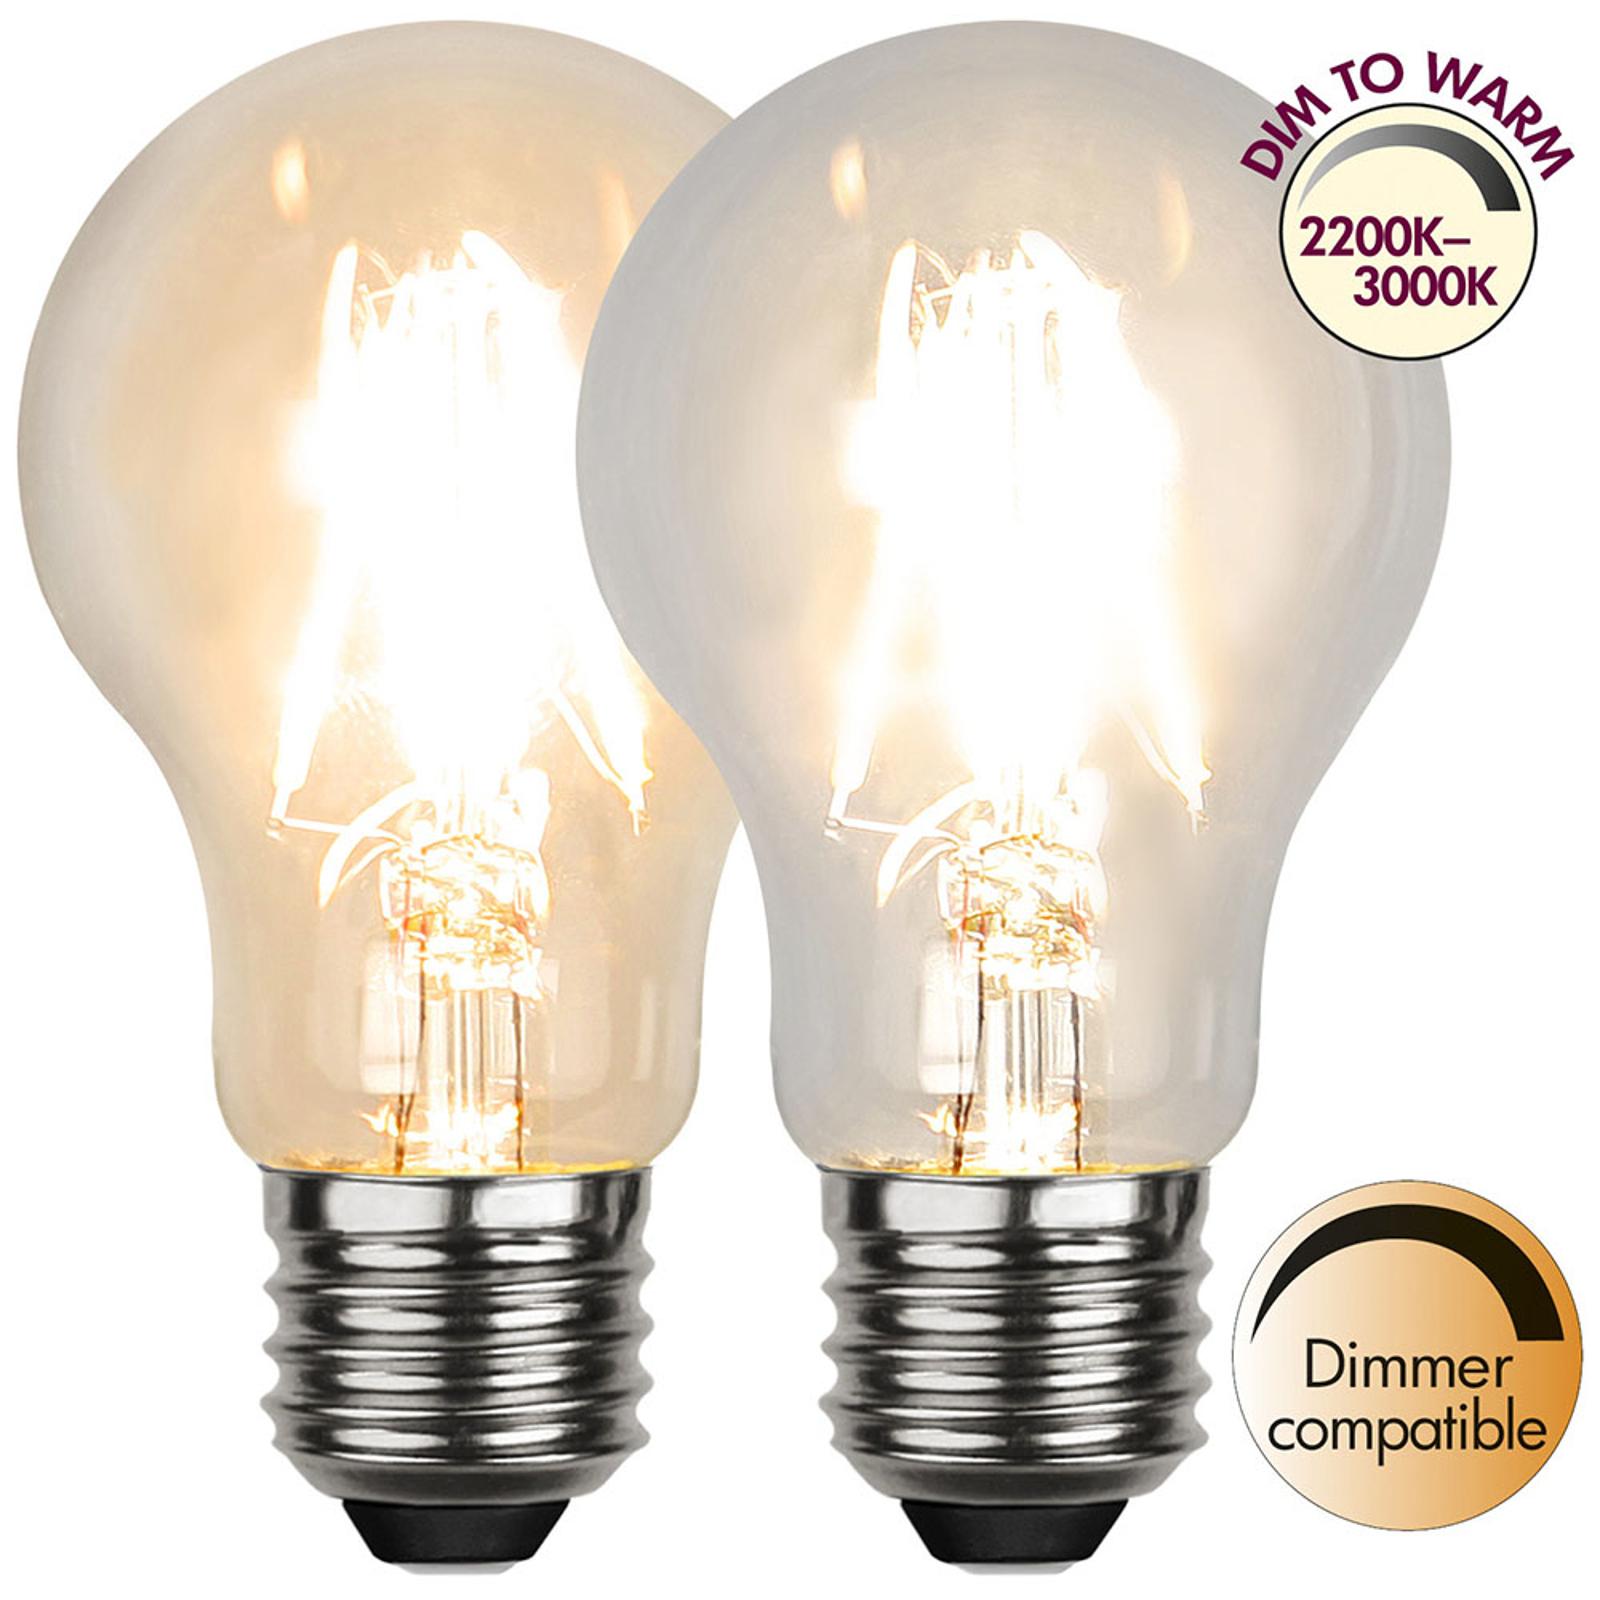 LED-Lampe E27 A60 4W 3.000K Filament, dim to warm